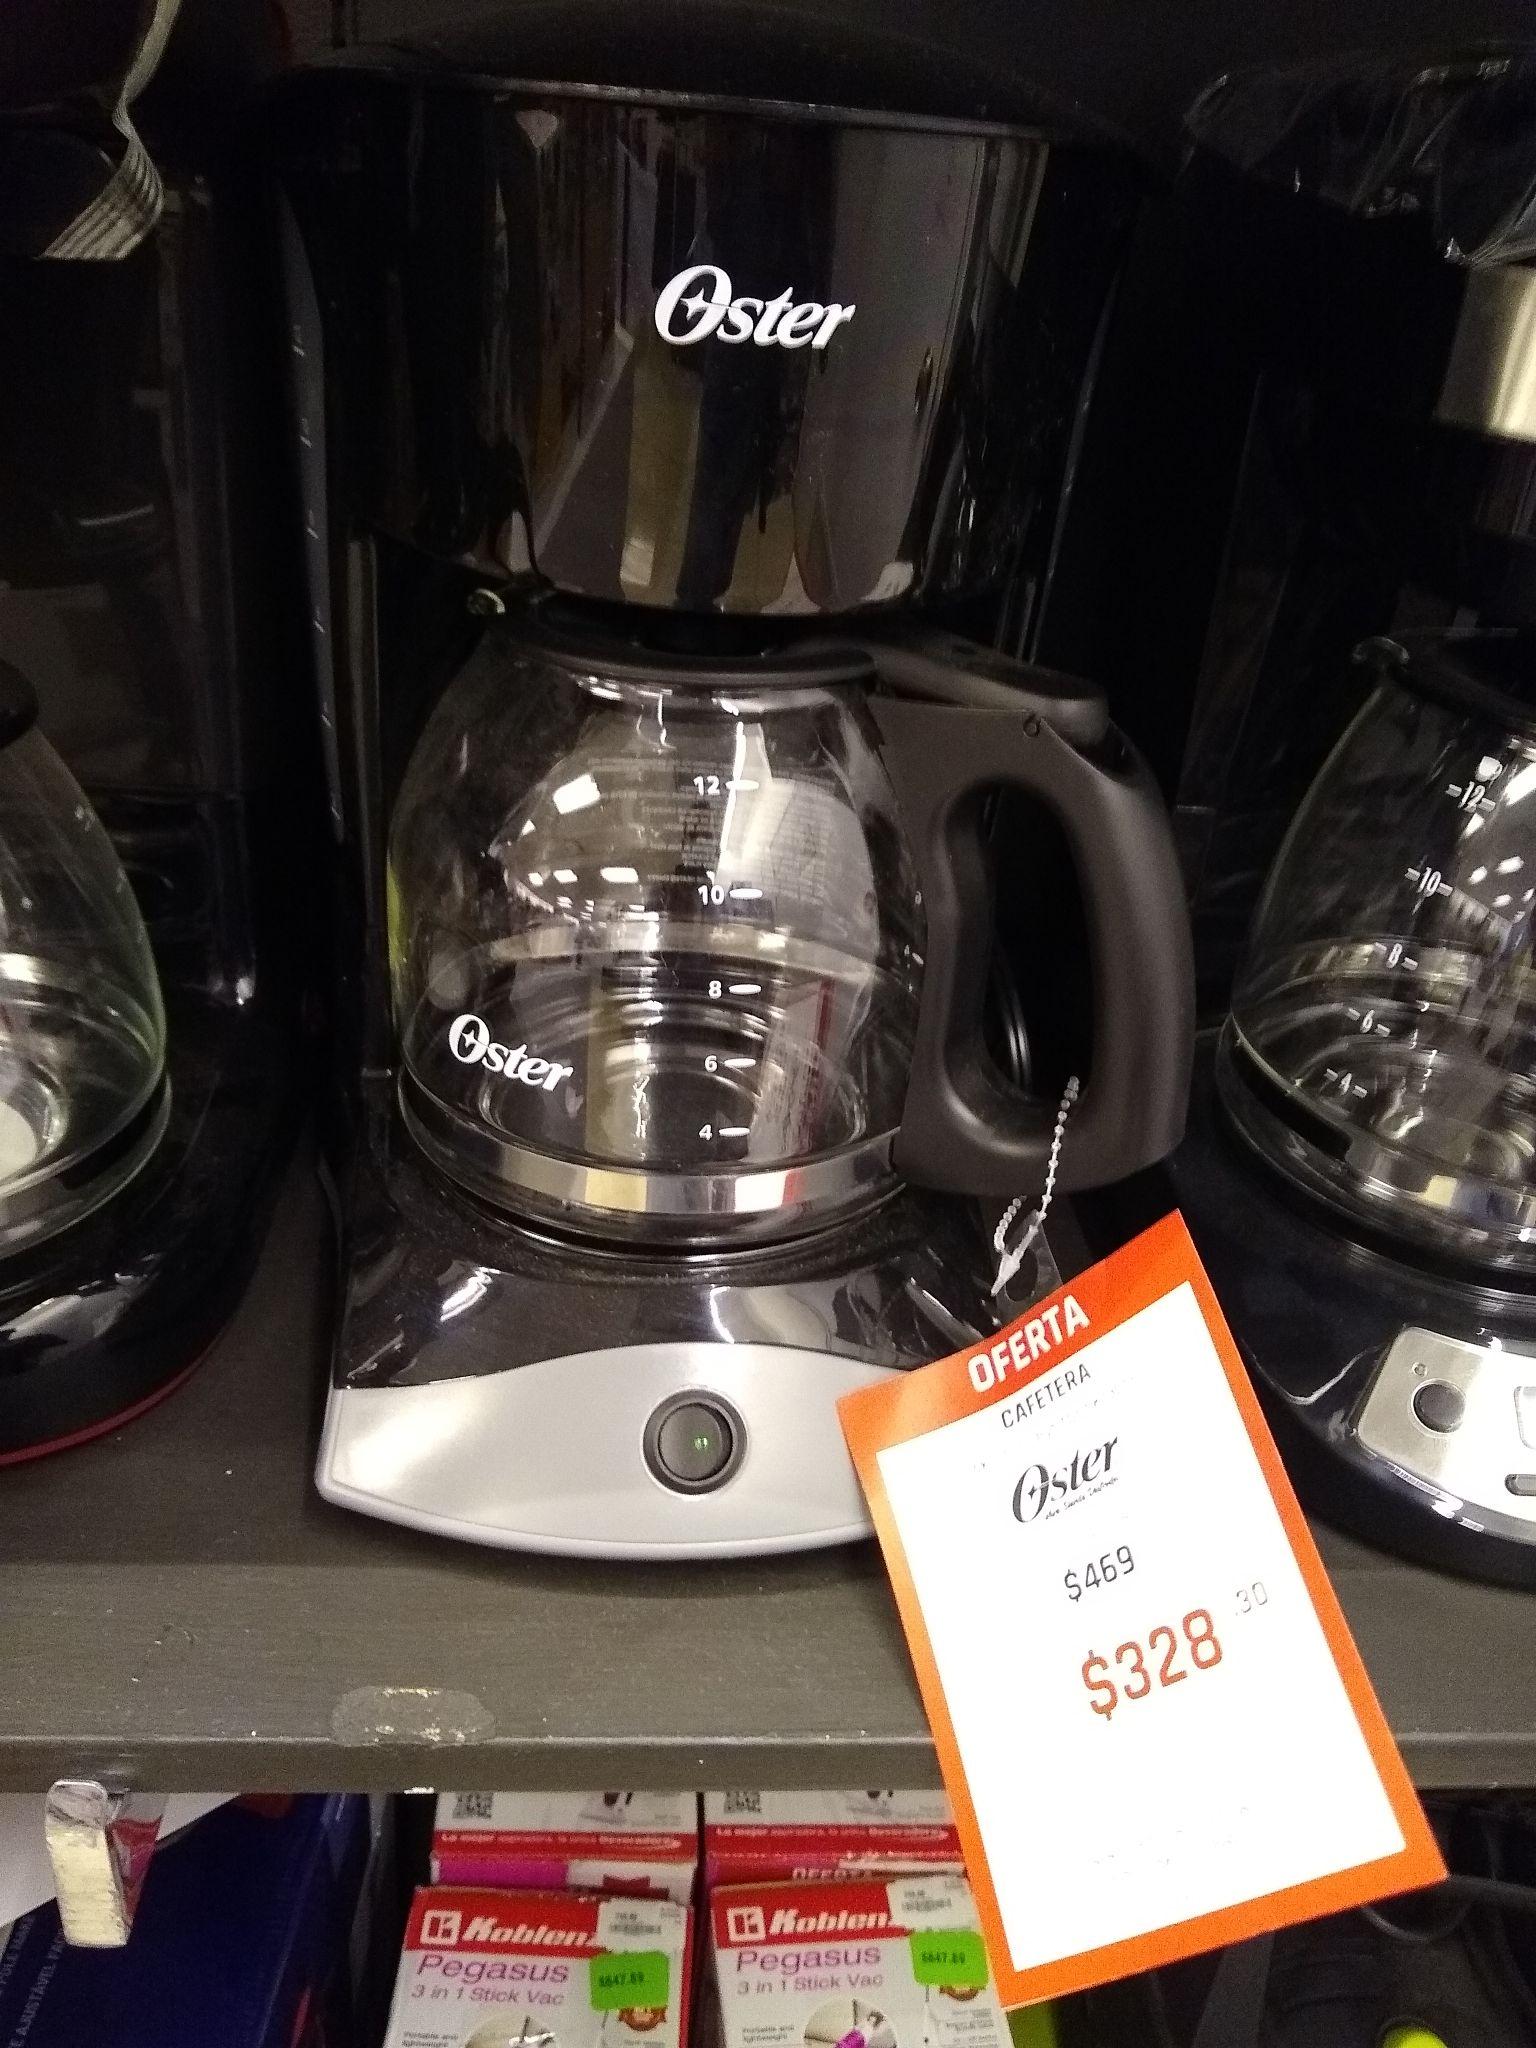 Suburbia: Cafetera Oster 12 tazas